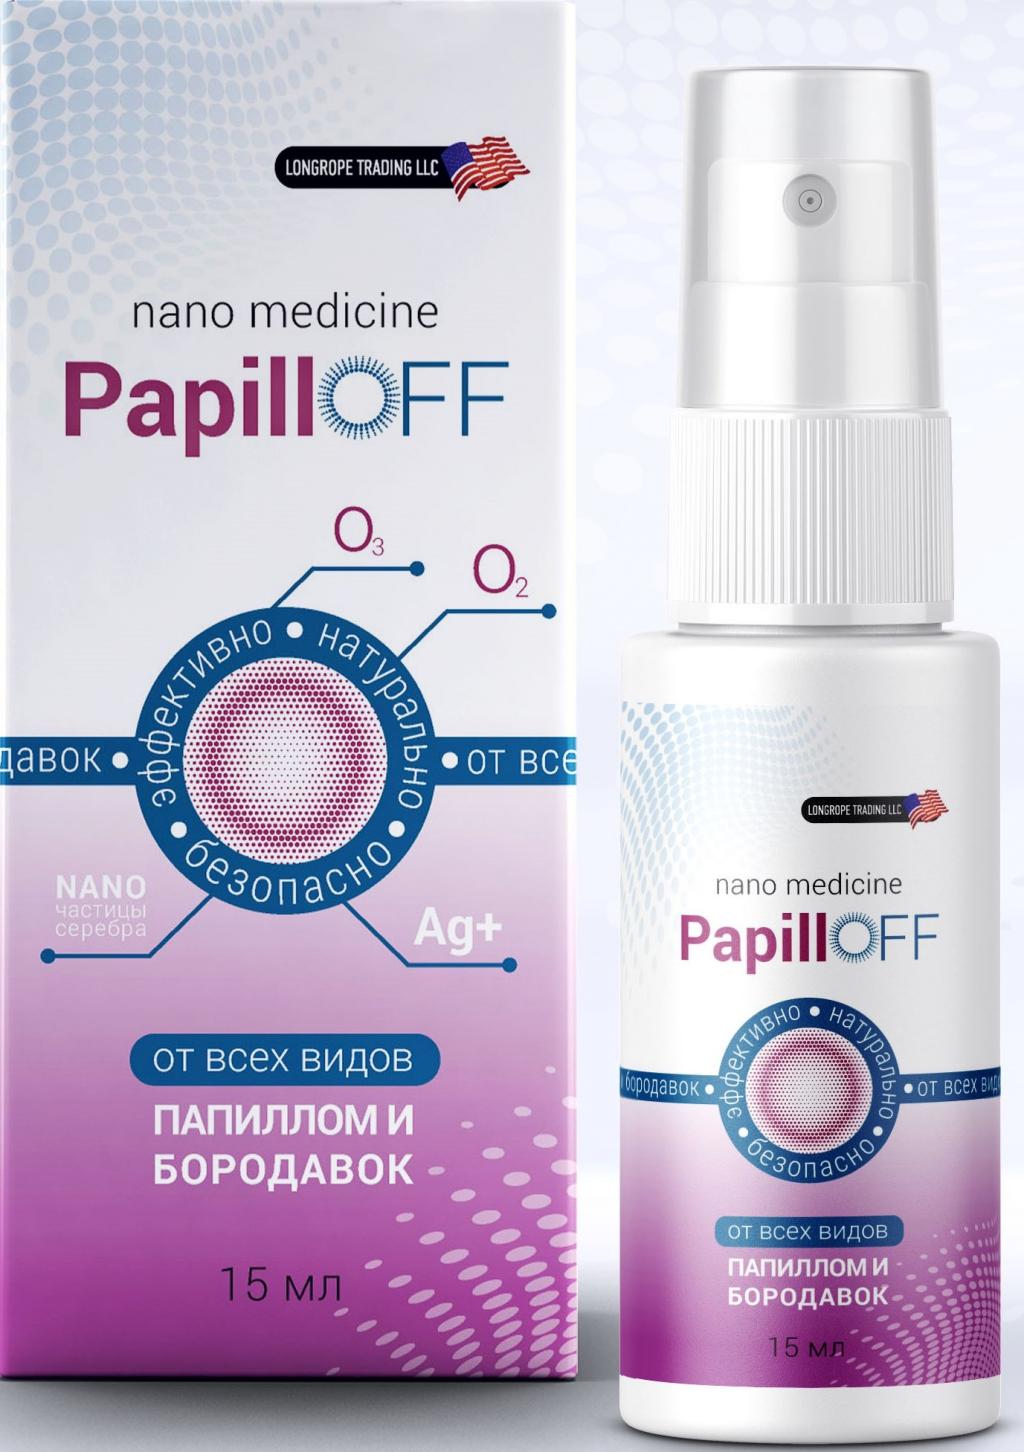 PapillOFF от папиллом и бородавок во Львове